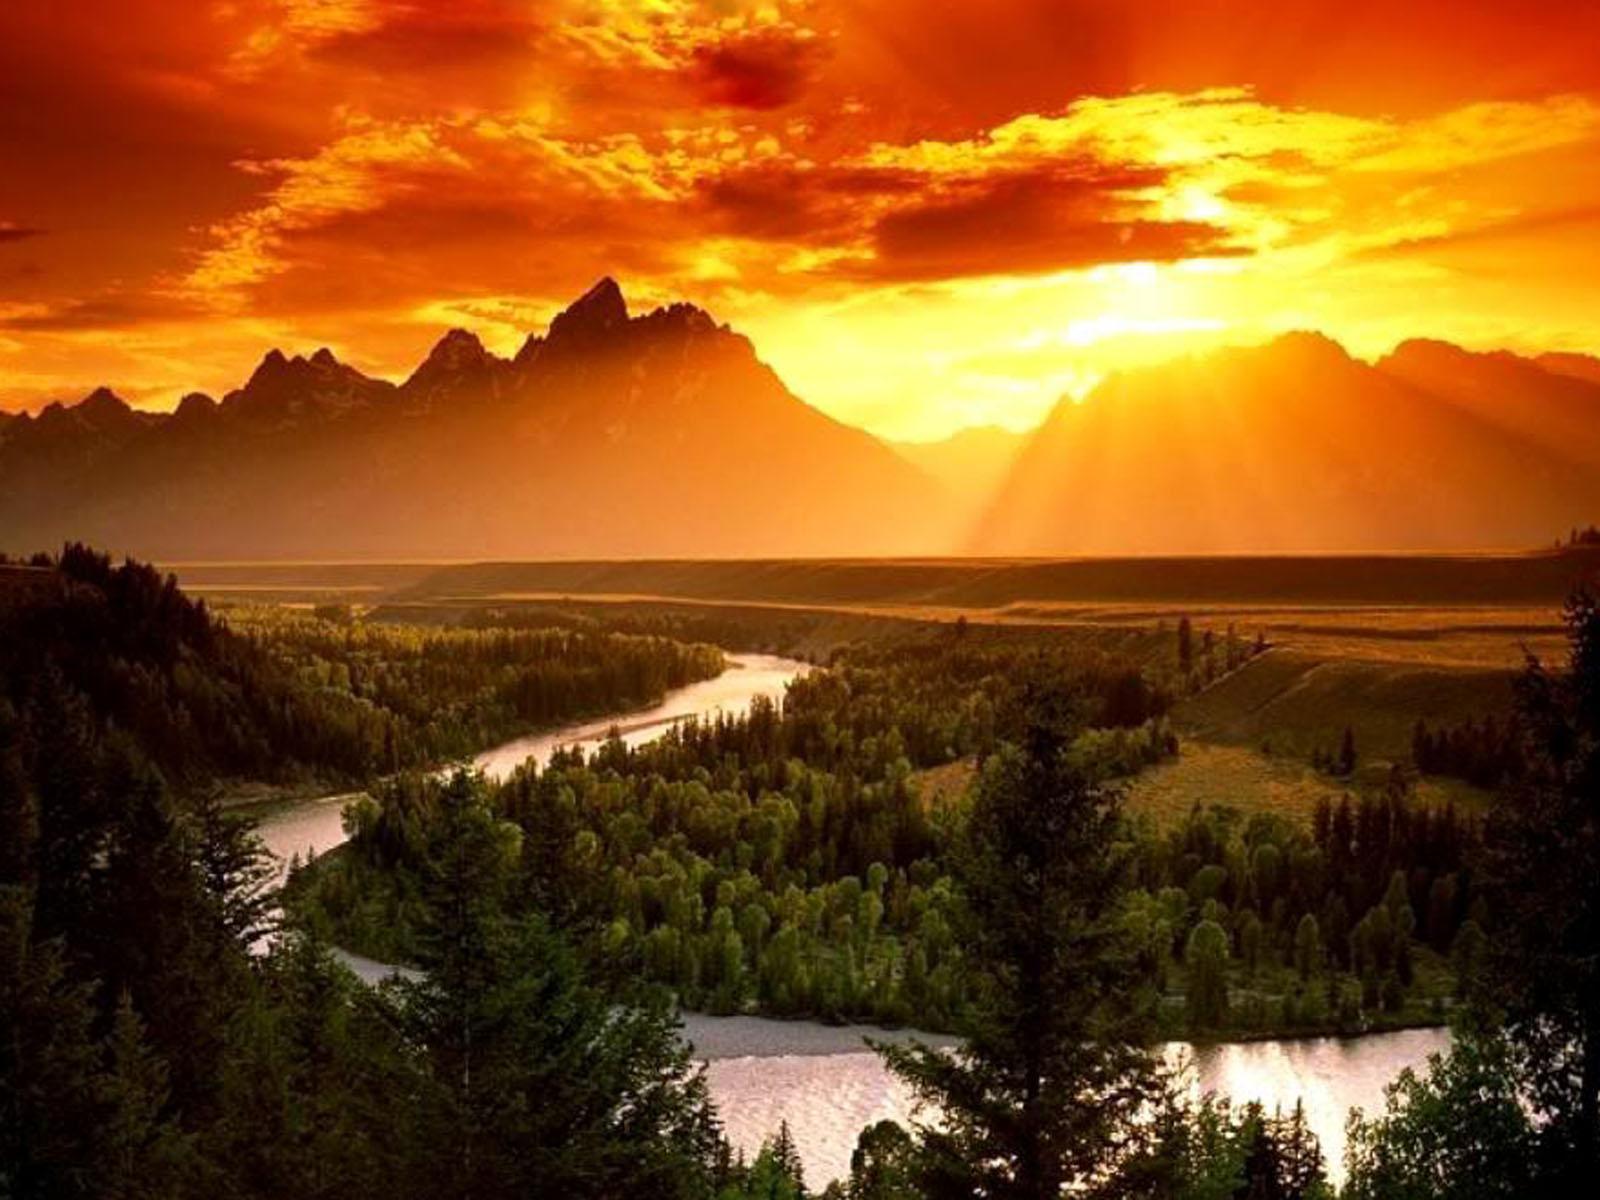 Amazing Sunrise Wallpaper